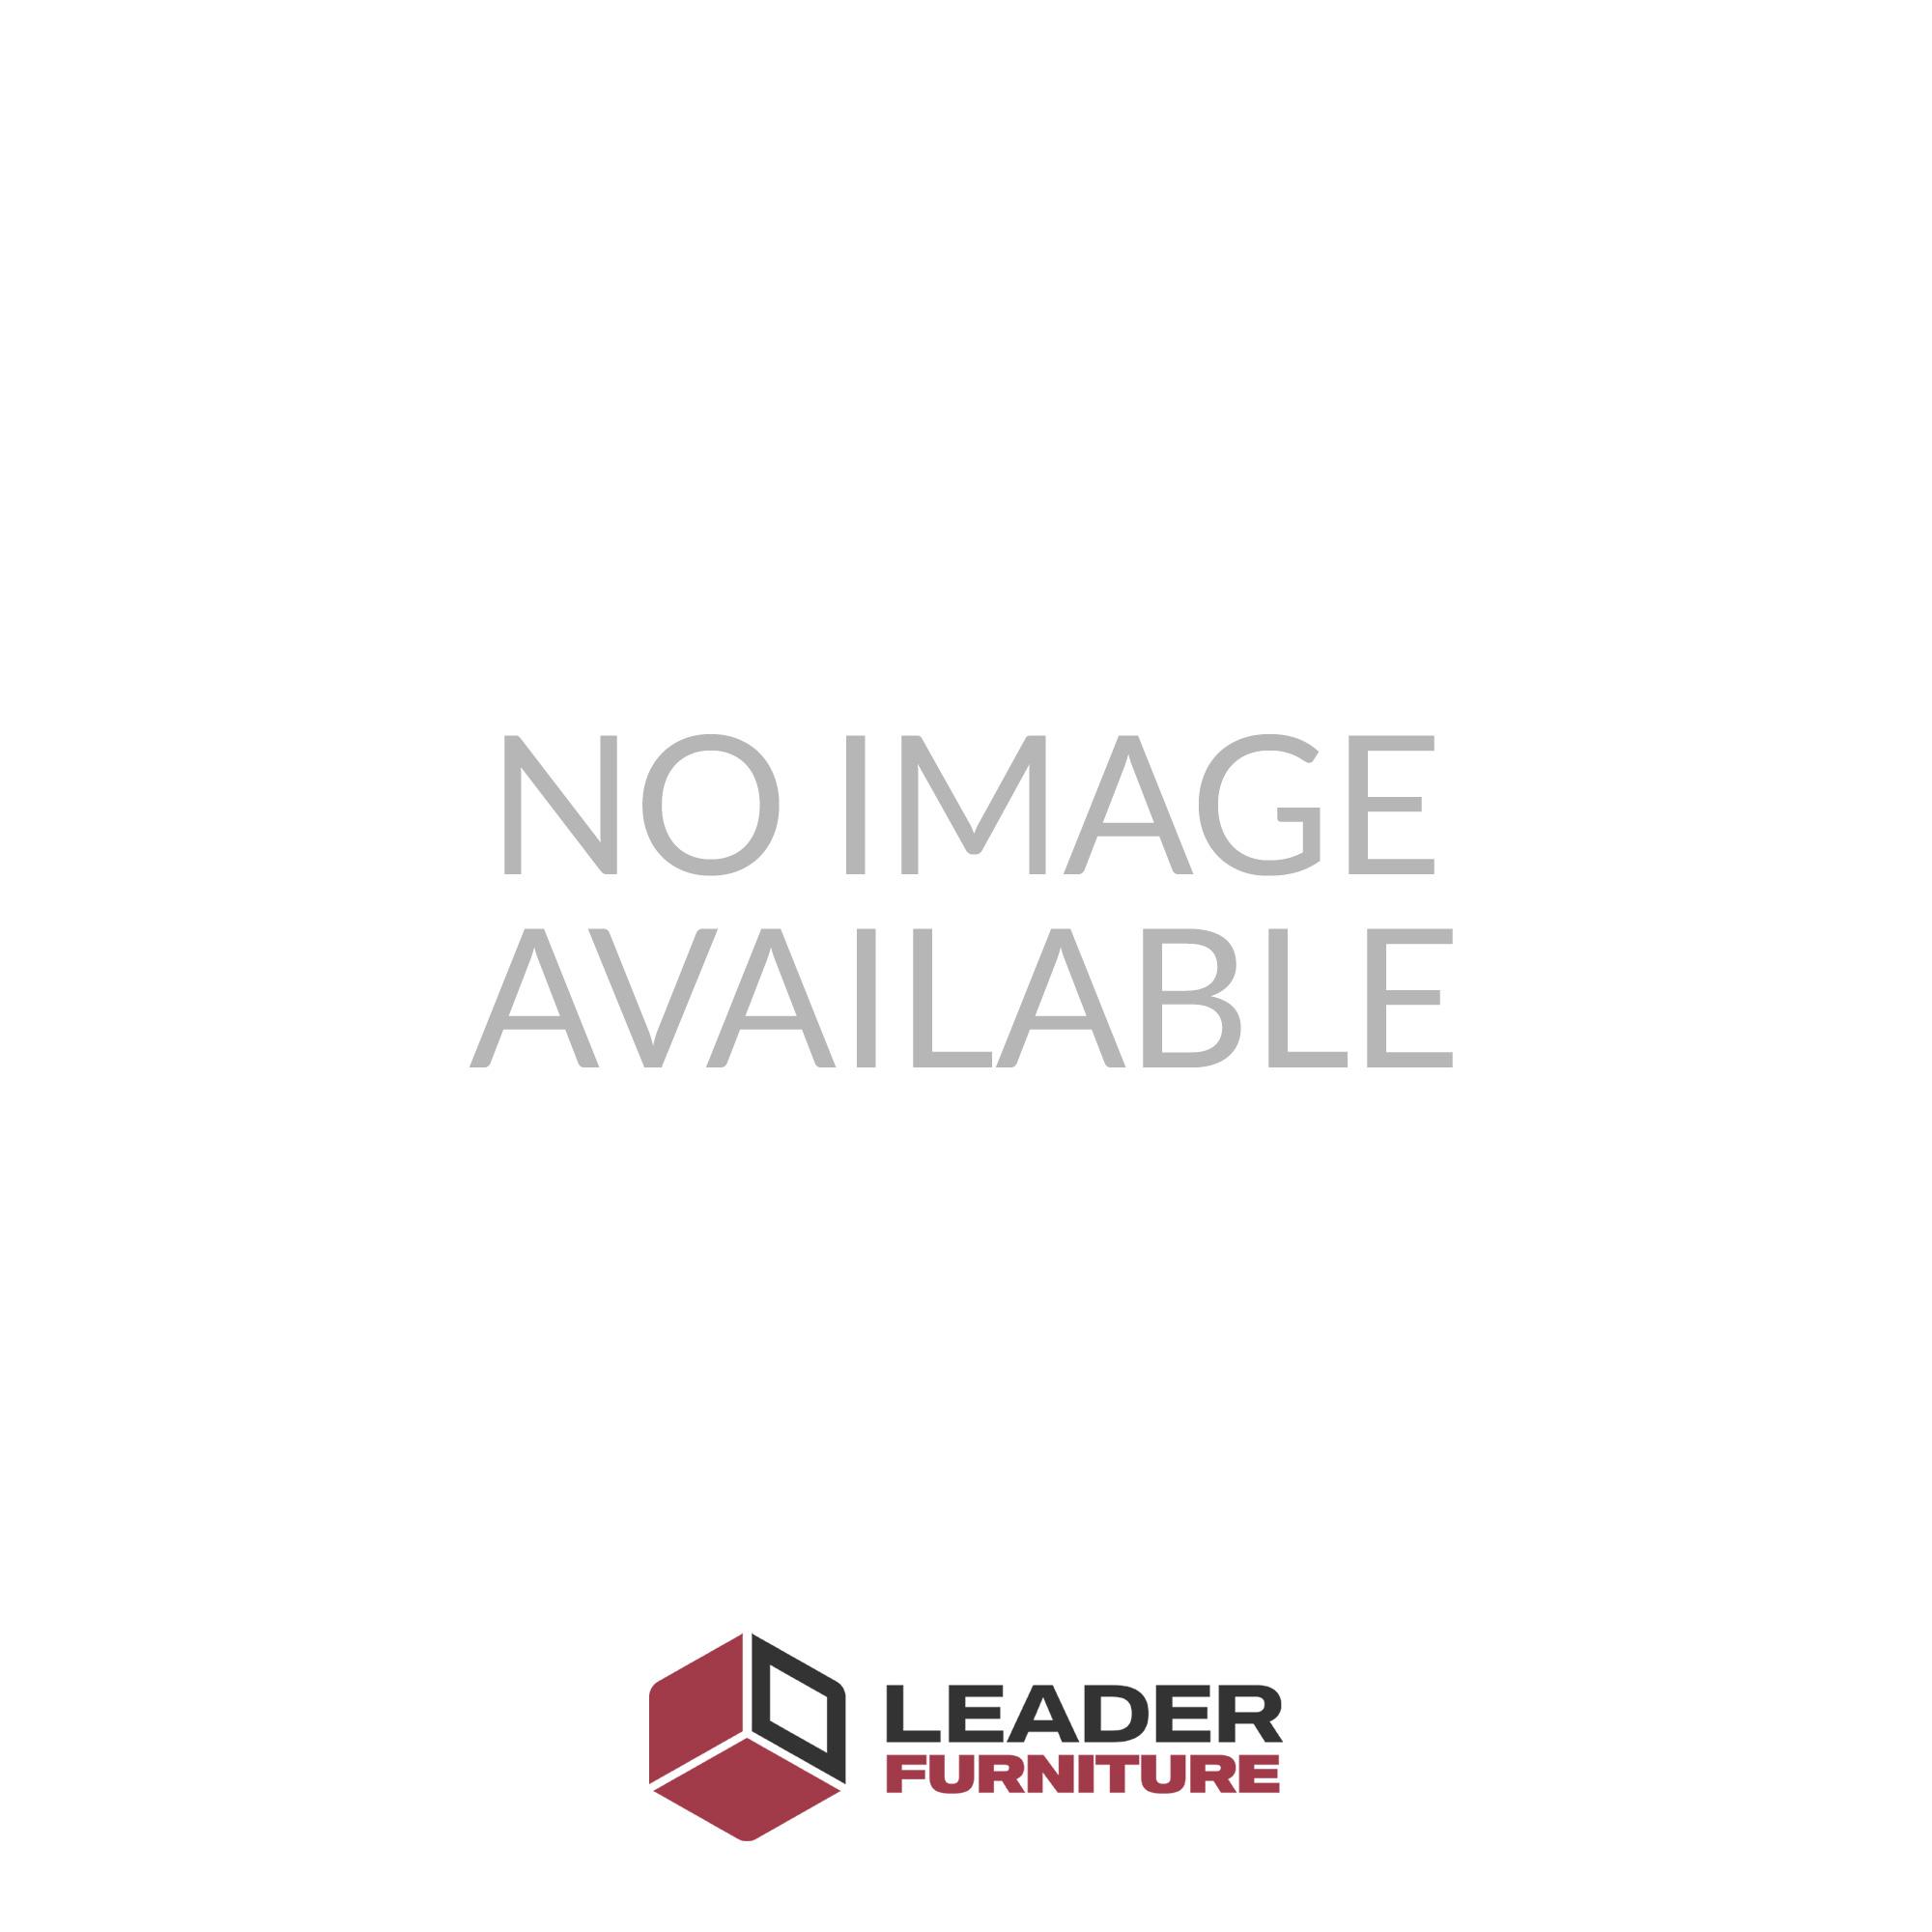 Supergloss Black Maxi V5 Micro Groove Laminate Flooring